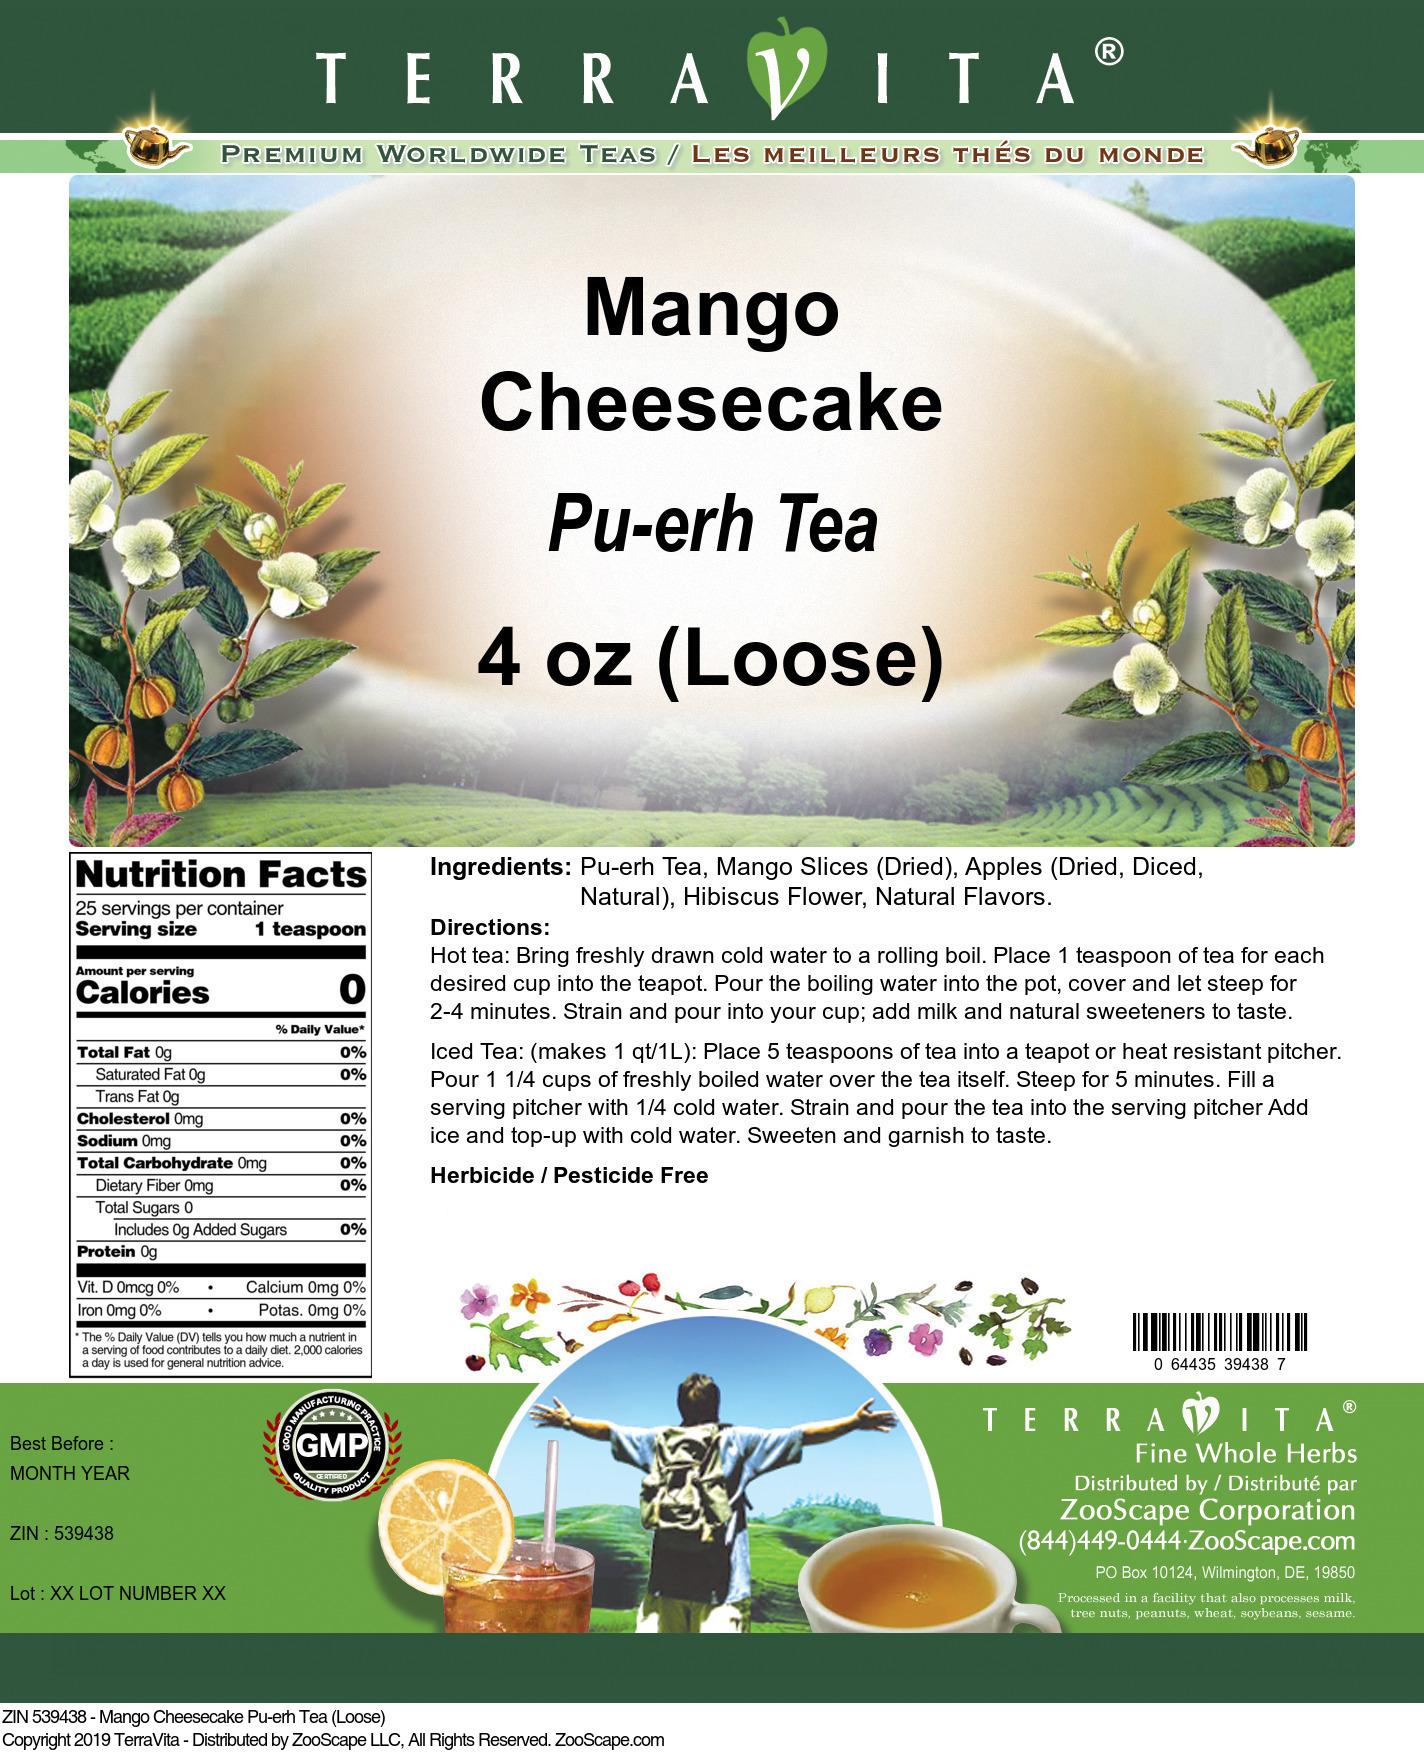 Mango Cheesecake Pu-erh Tea (Loose)